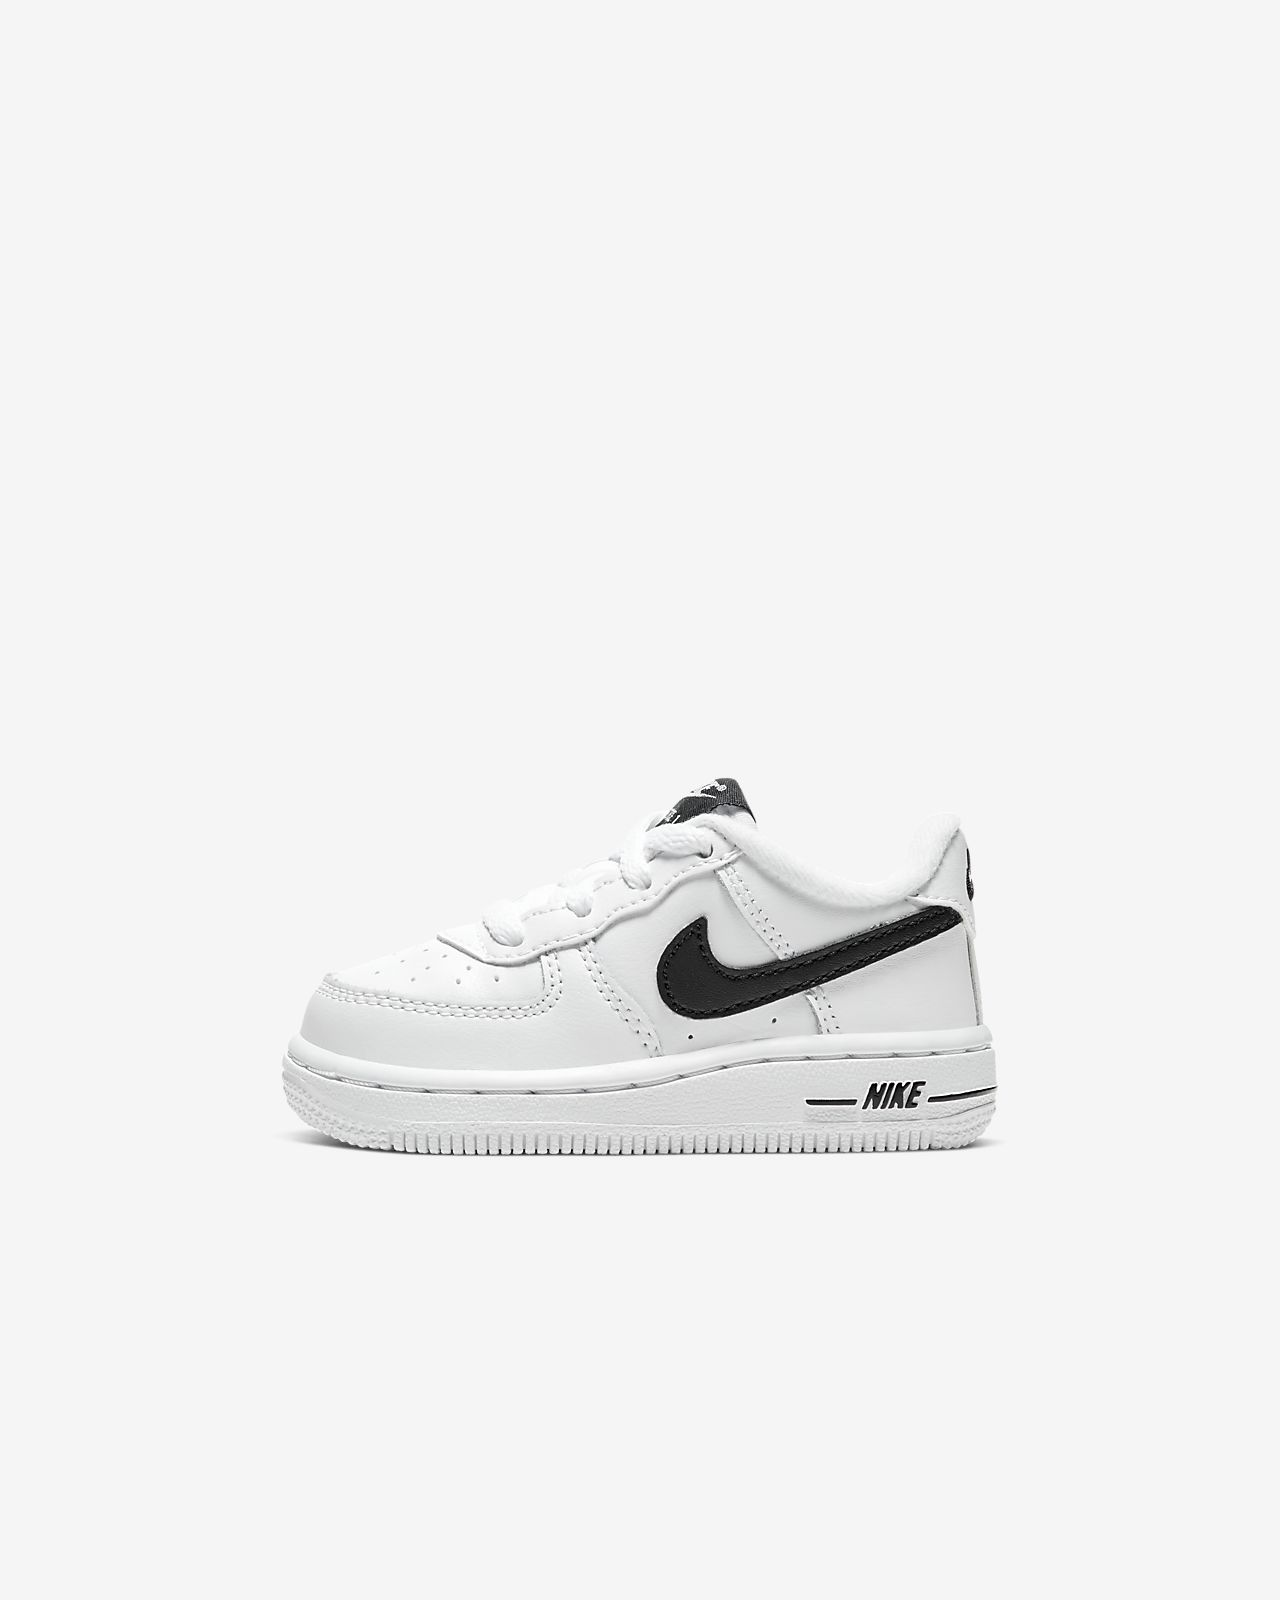 Nike Force 1 sko til babyersmåbørn